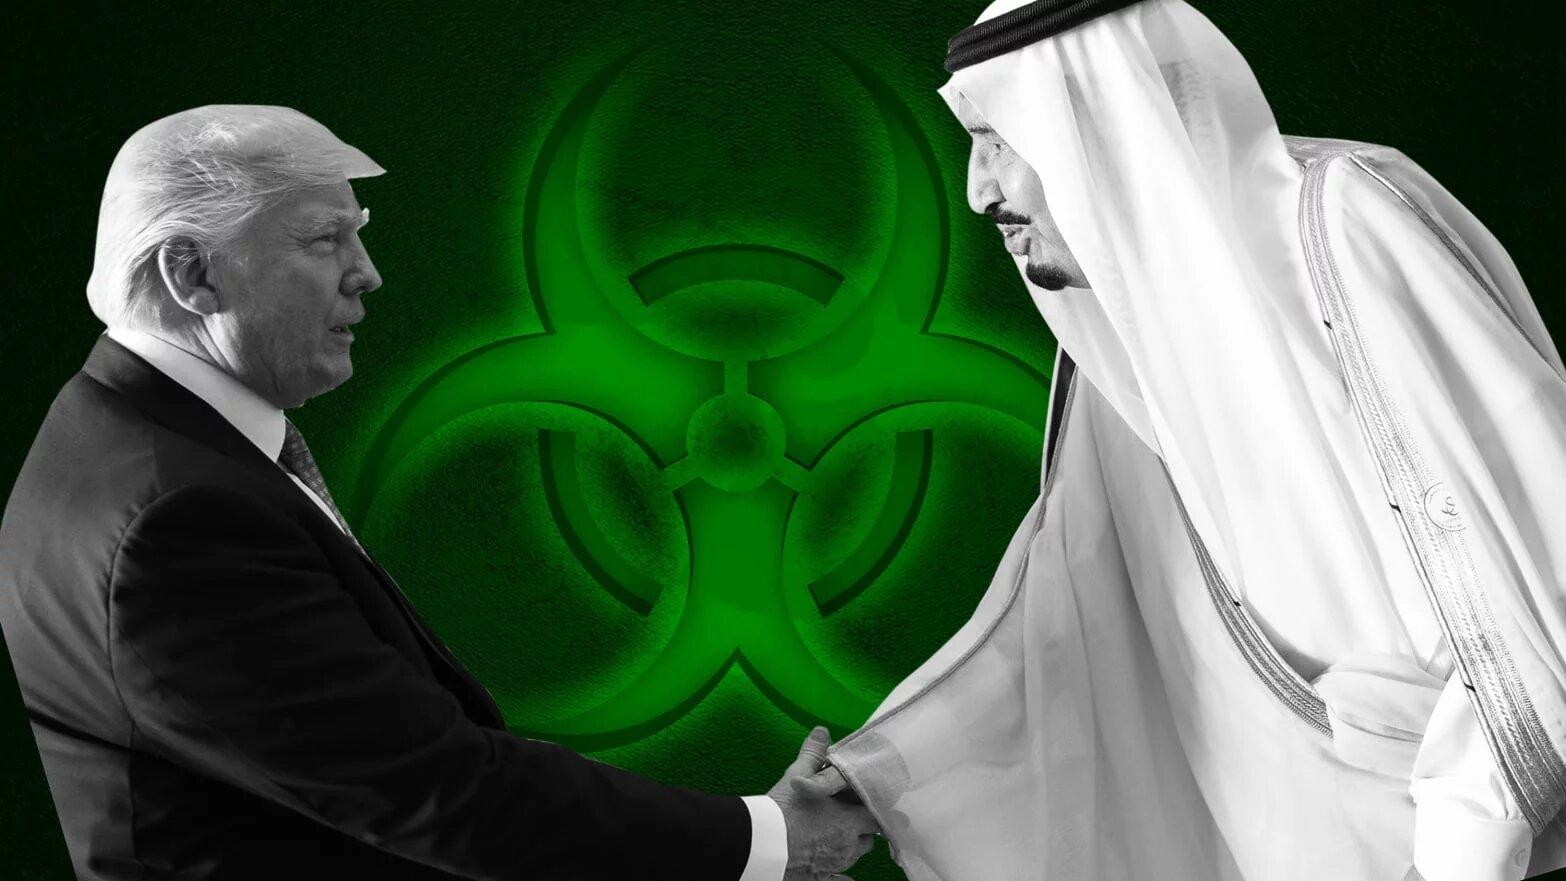 Doble rasero nuclear: Arabia Saudí puede enriquecer uranio, para Irán está vetado